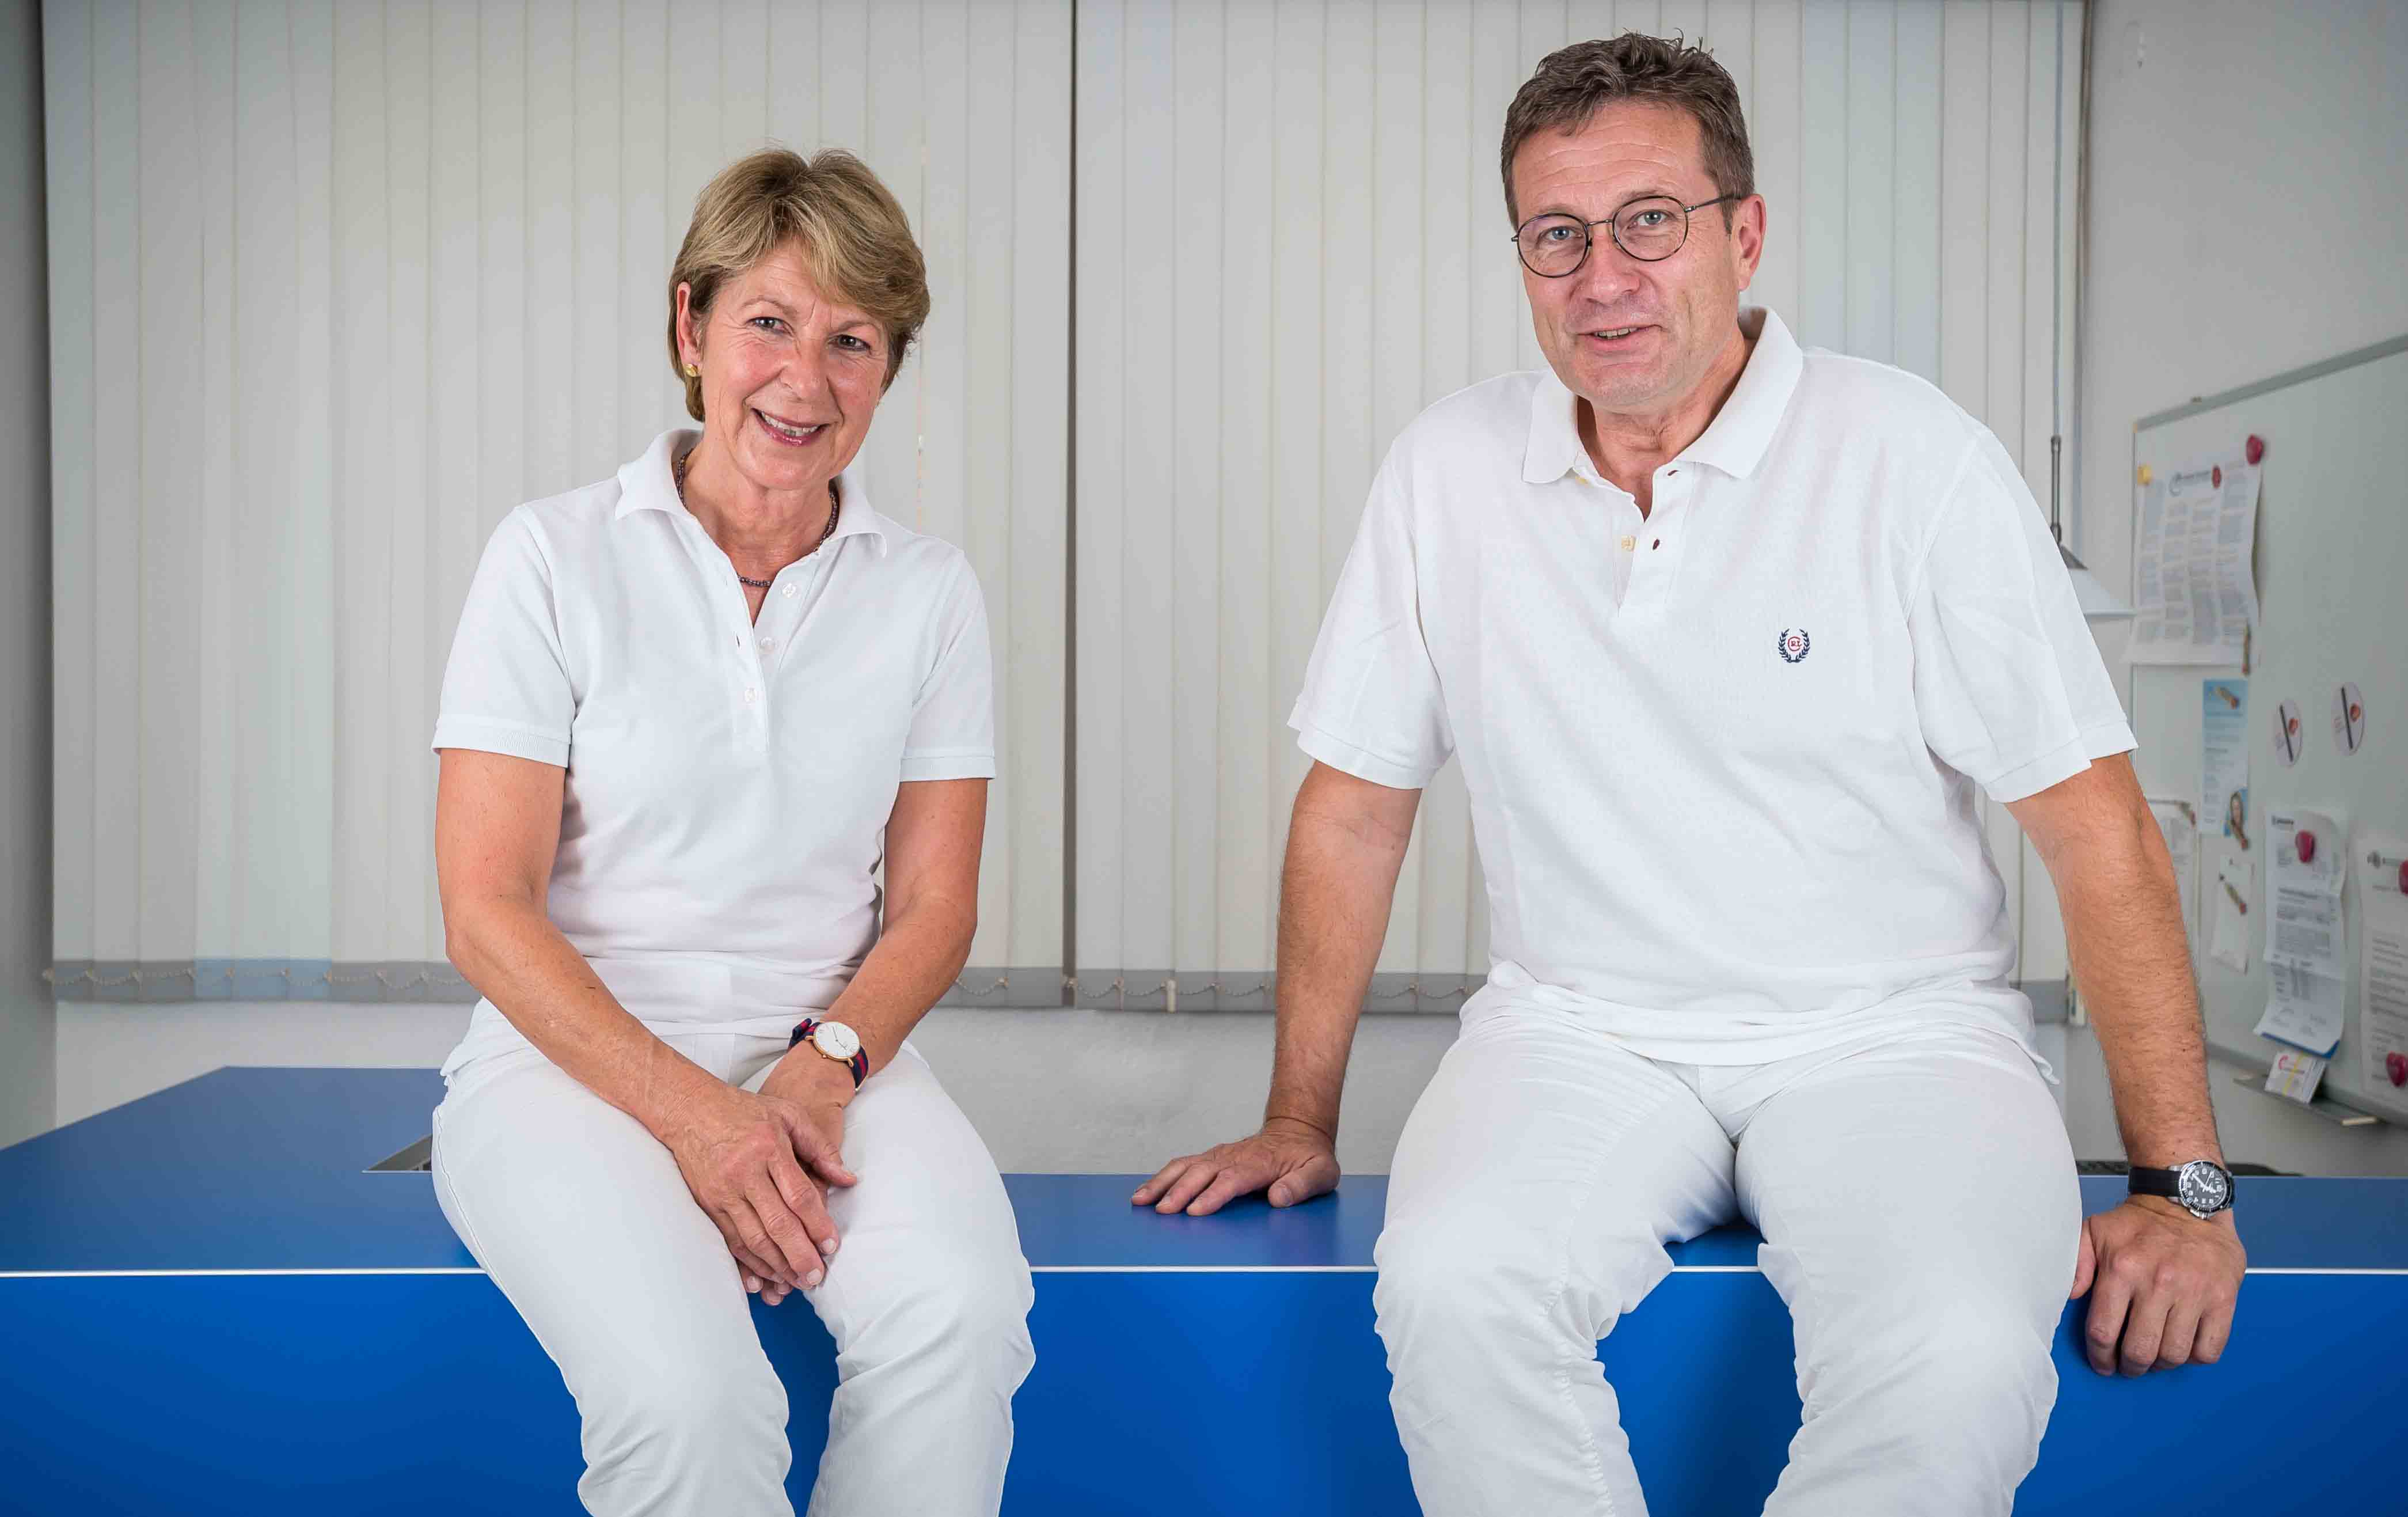 Frau Dr. Martina Horn und Herr Dr. Christian Höppner